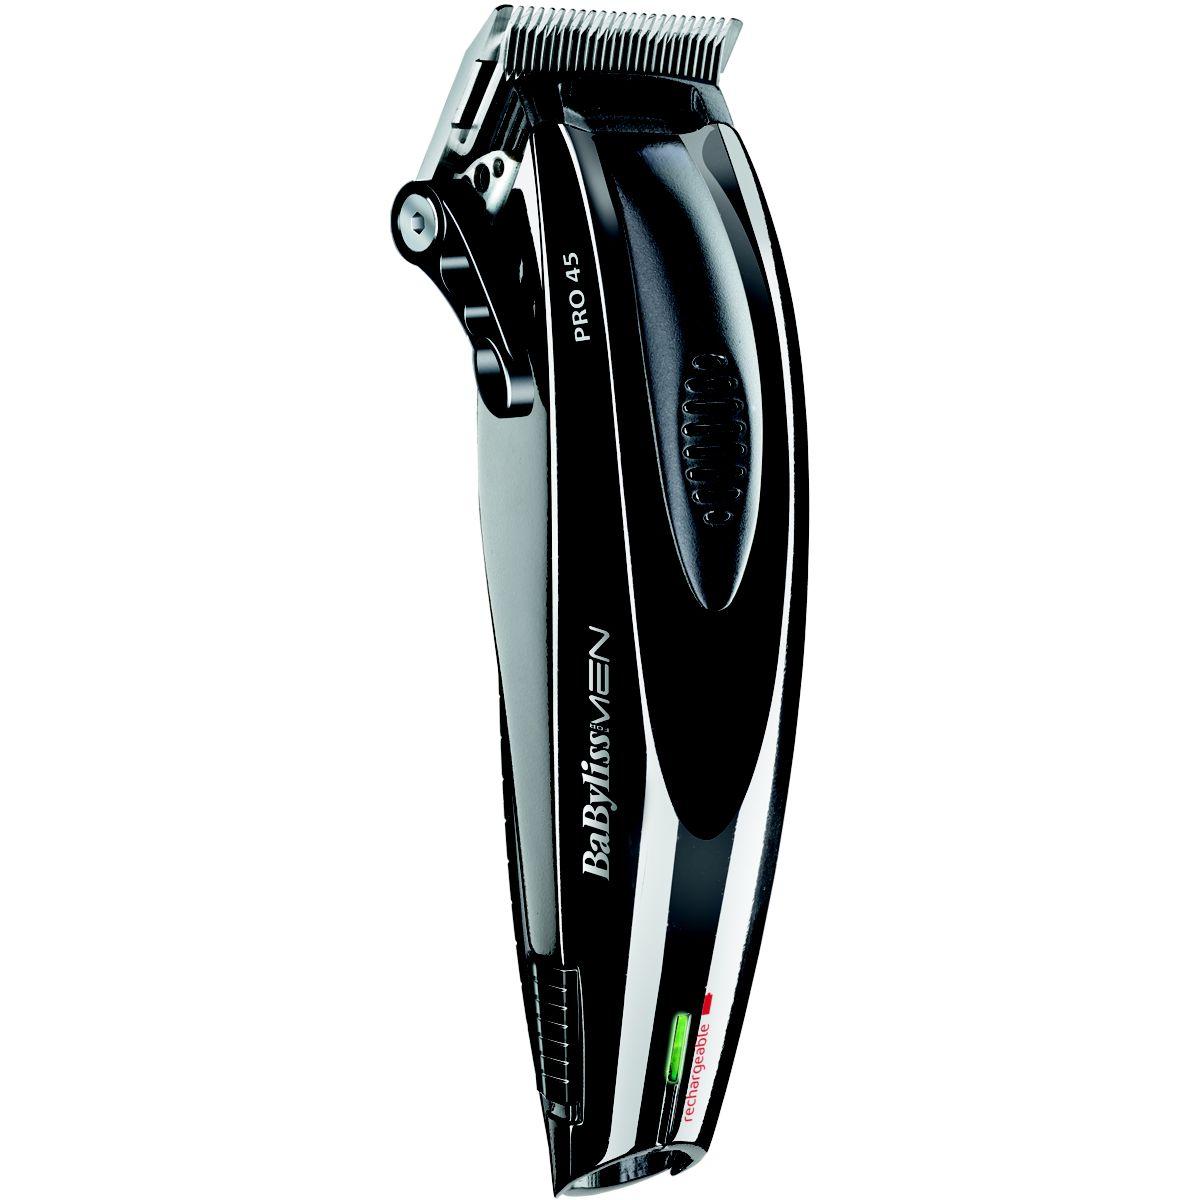 Tondeuse cheveux BABYLISS E951E